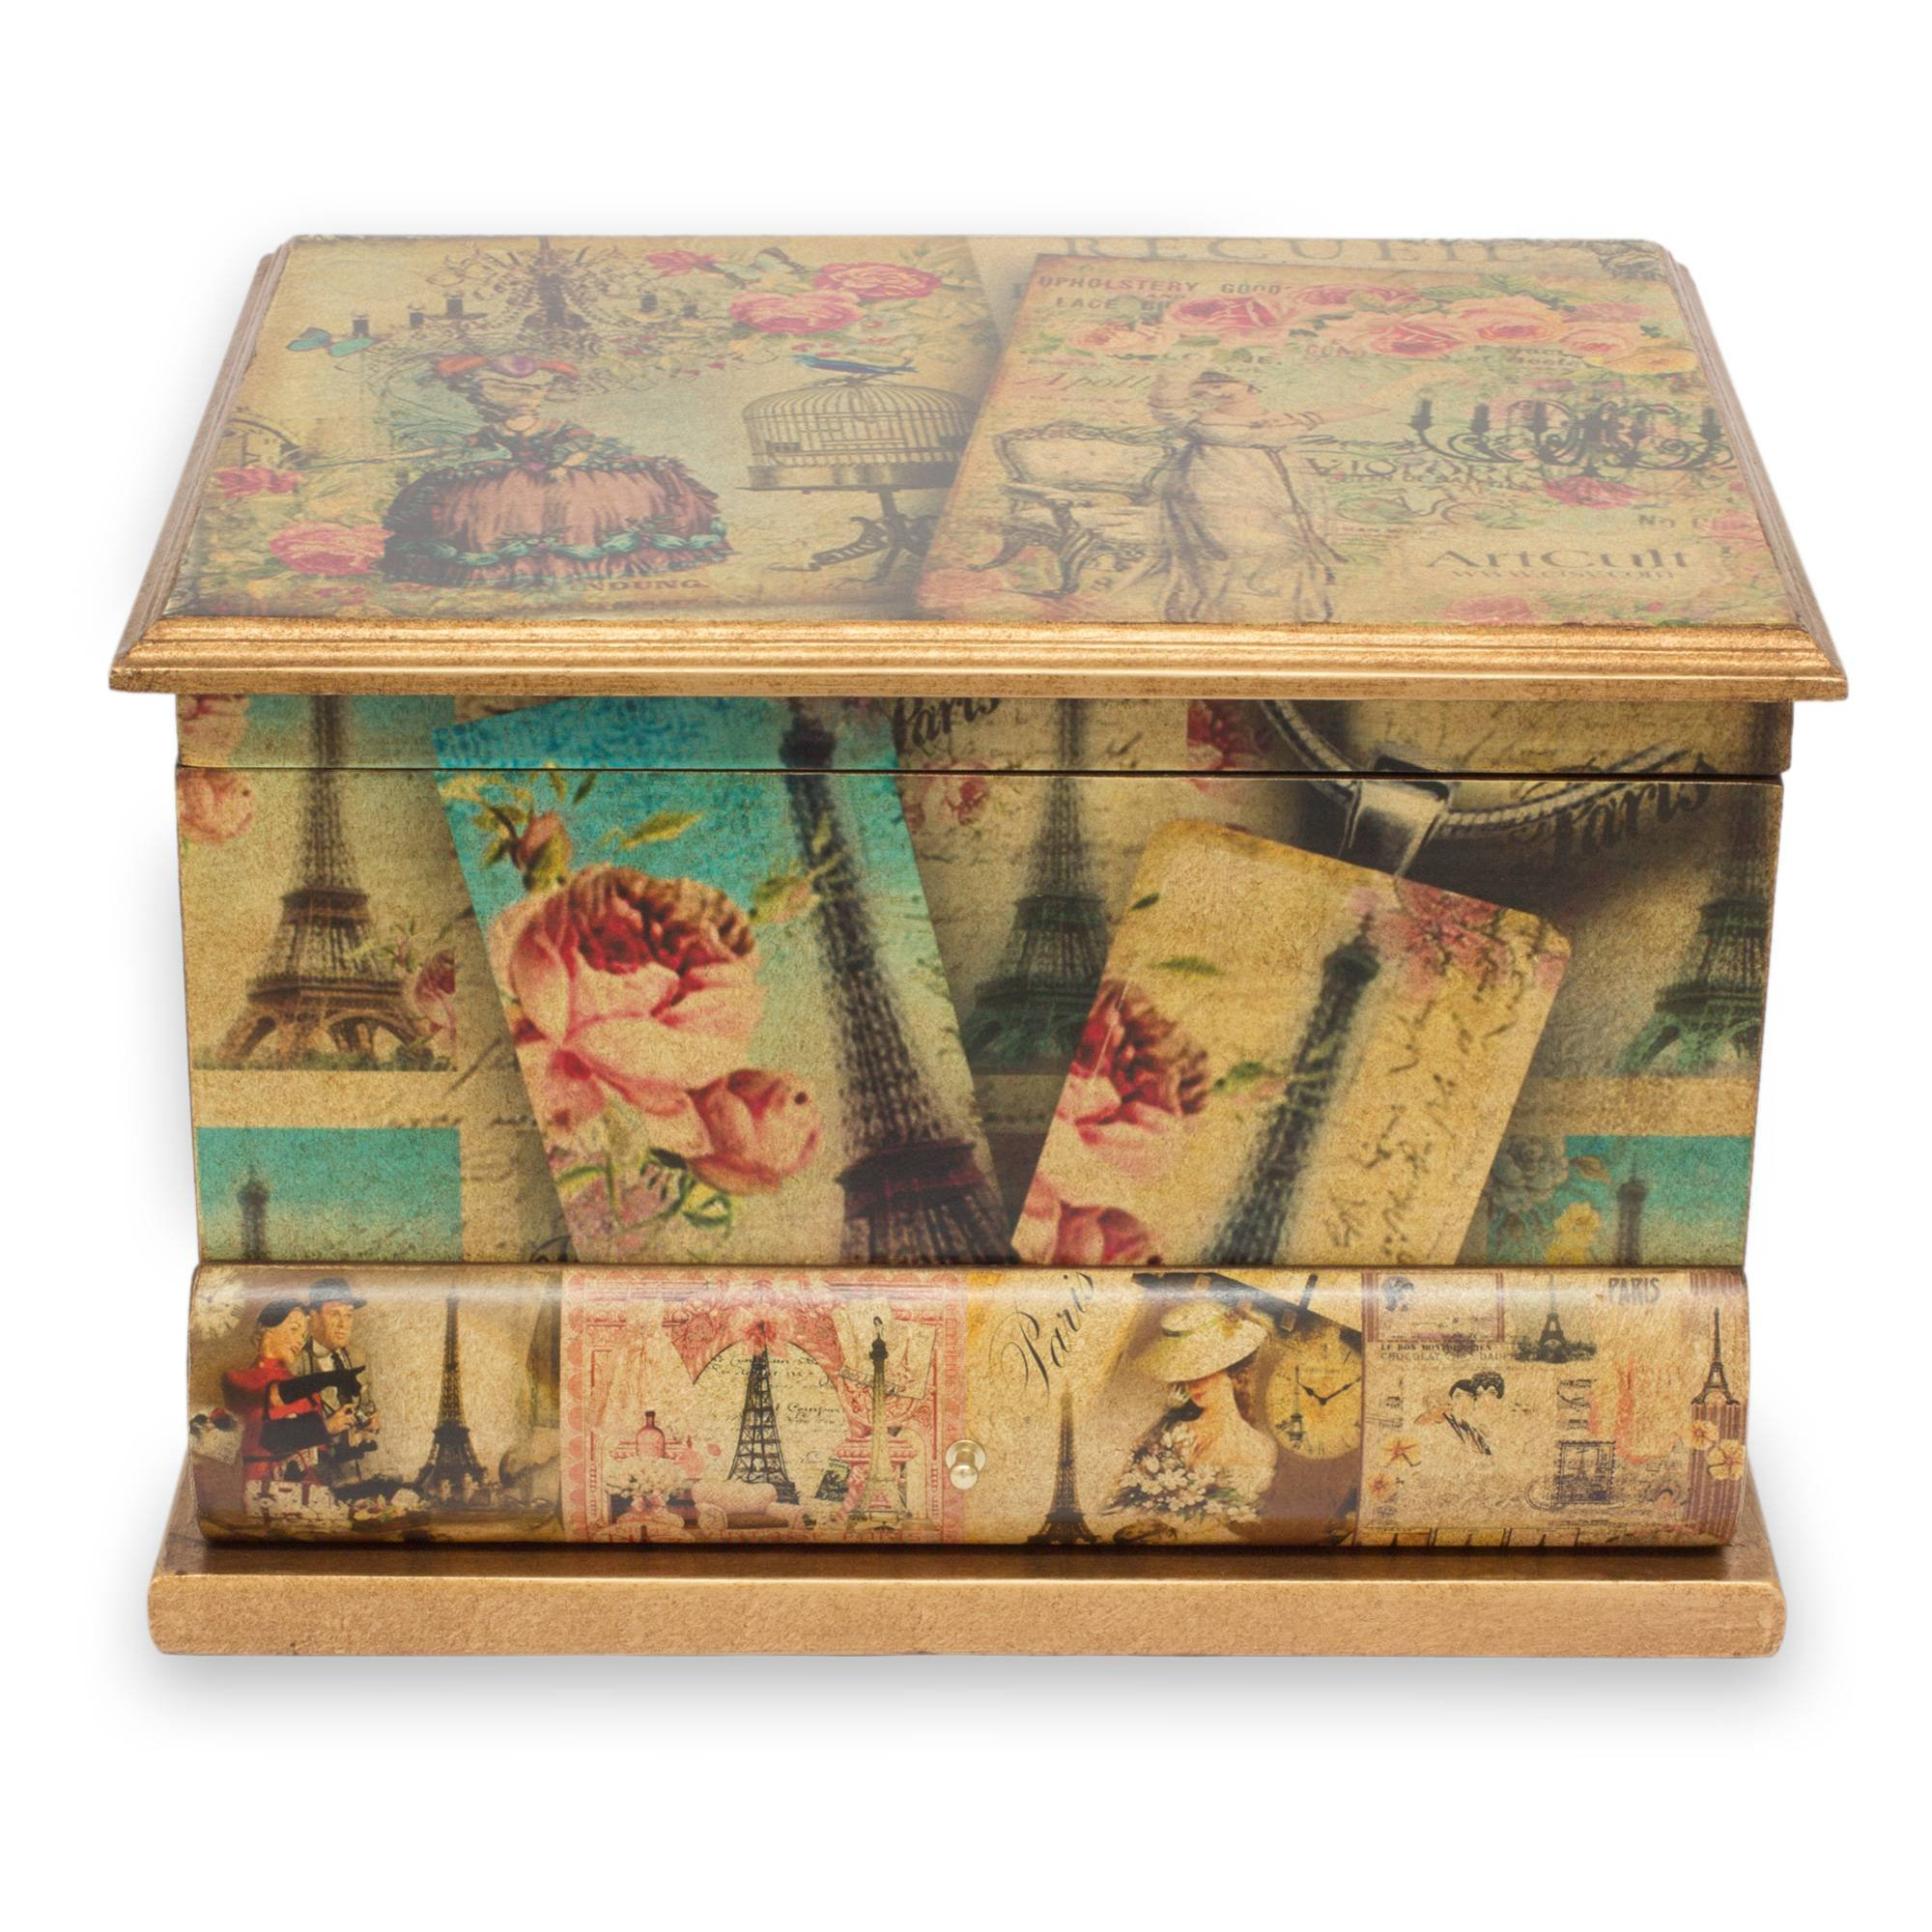 NOVICA Artisan Crafted Paper Wood Decoupage Jewelry Box, Multicolor, Carlota's Memories'